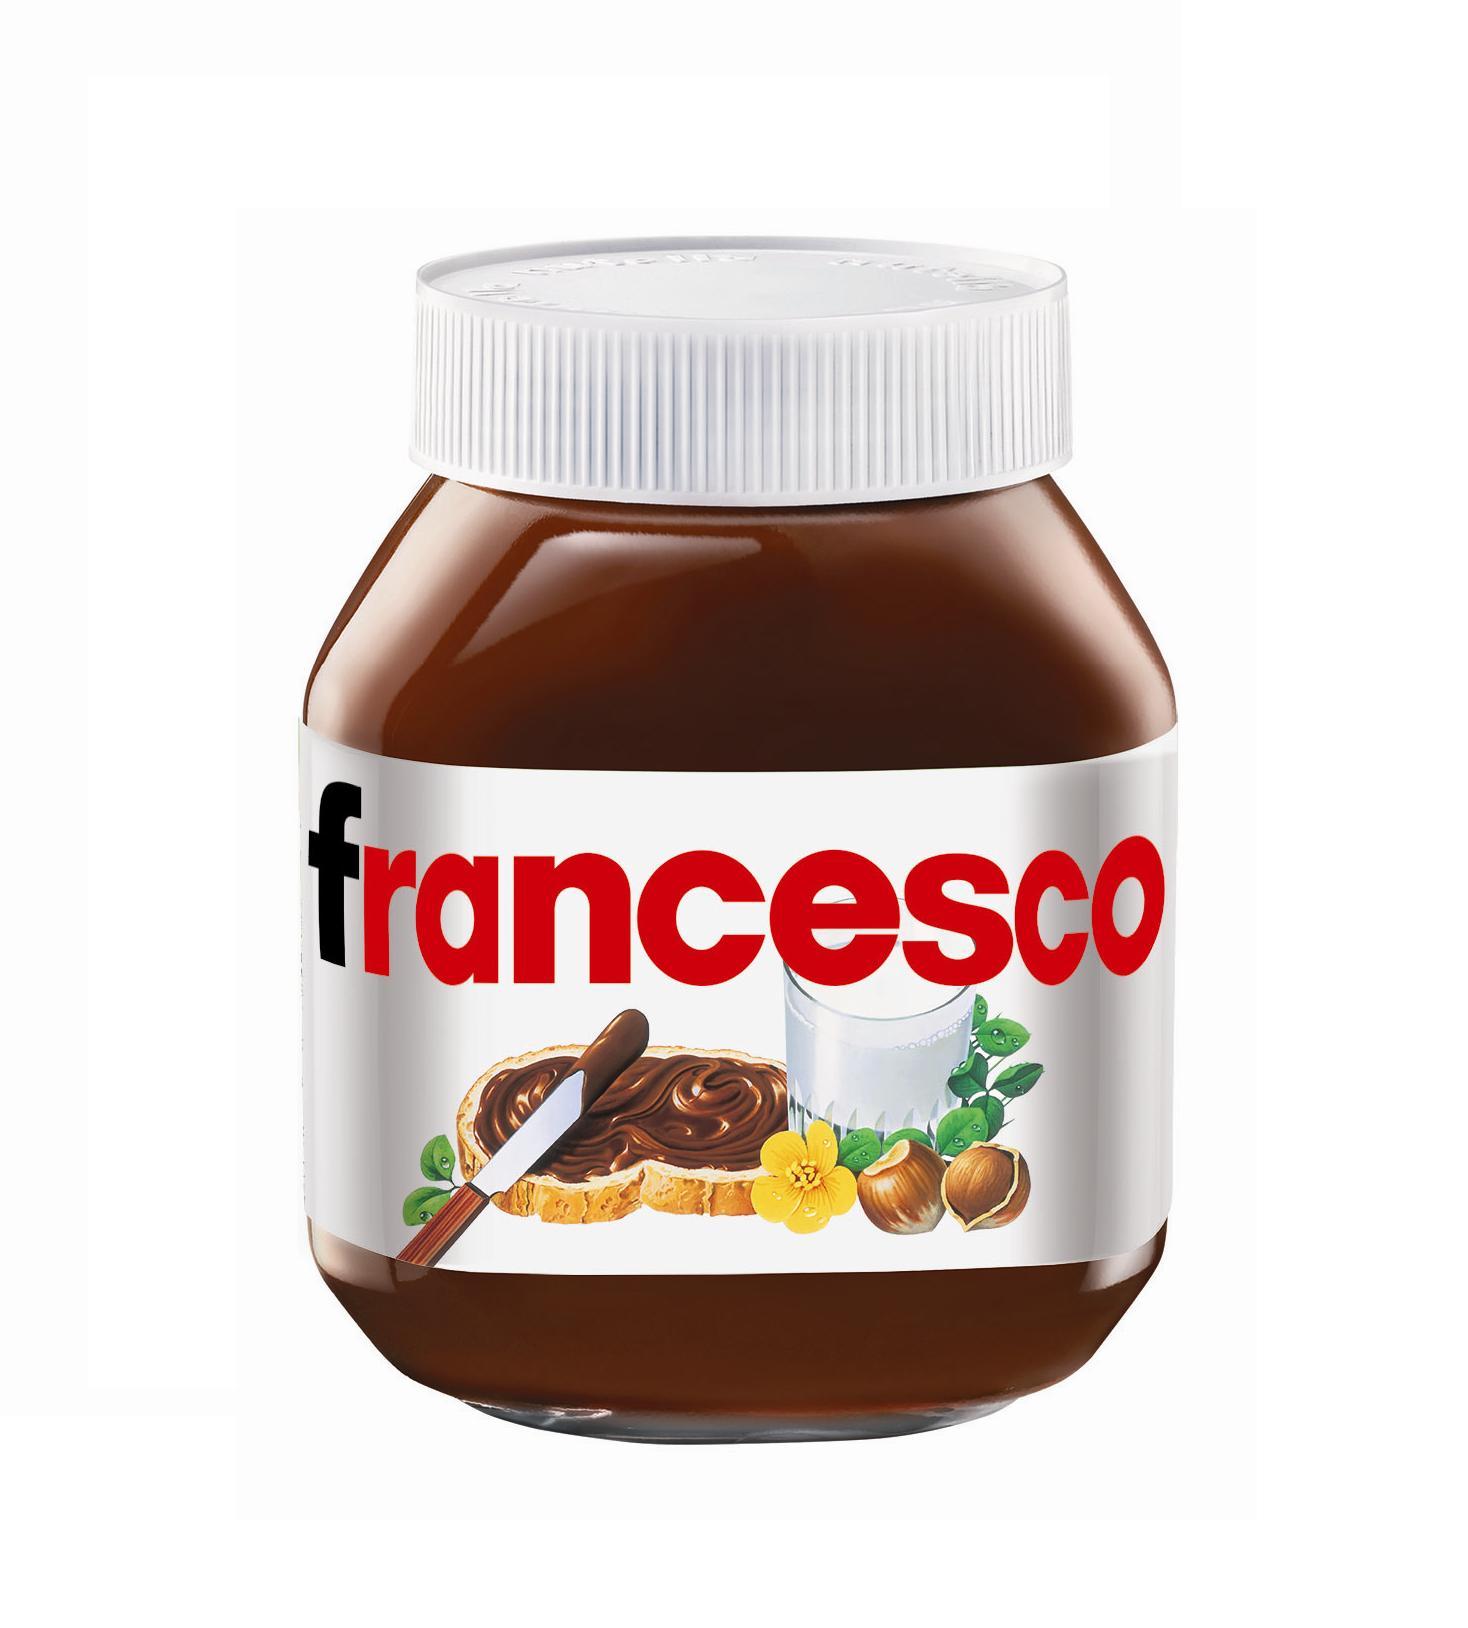 https://www.promotionmagazine.it/wp/wp-content/uploads/2013/09/Nutella_francesco2.jpg